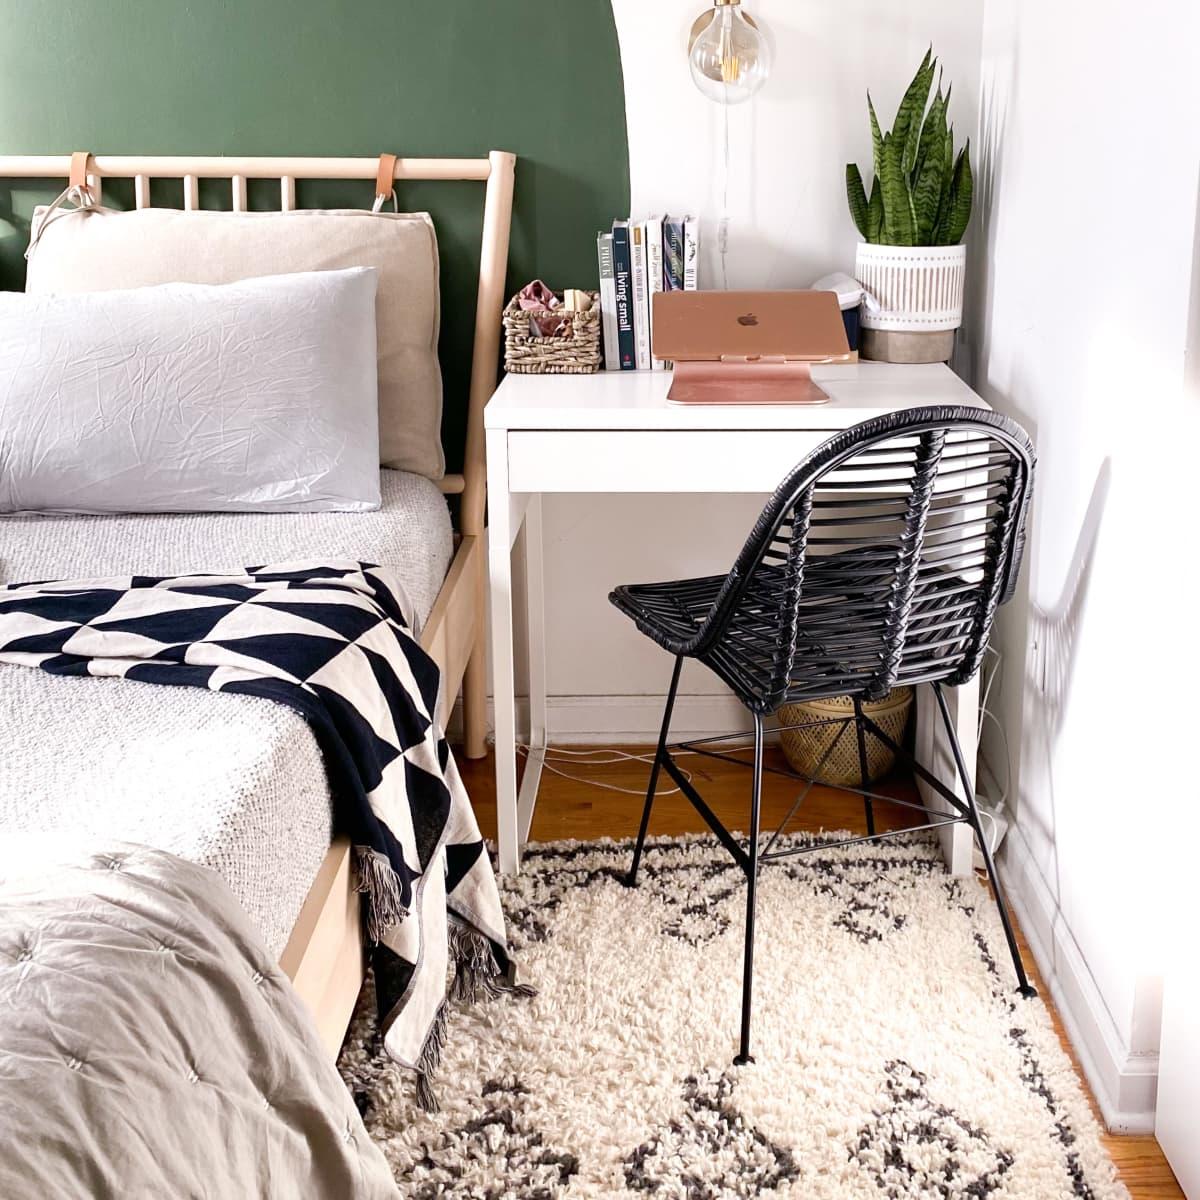 This Design Expert's Organized 750-Square-Foot Rental Apartment Is Full of Brilliant Hidden Storage